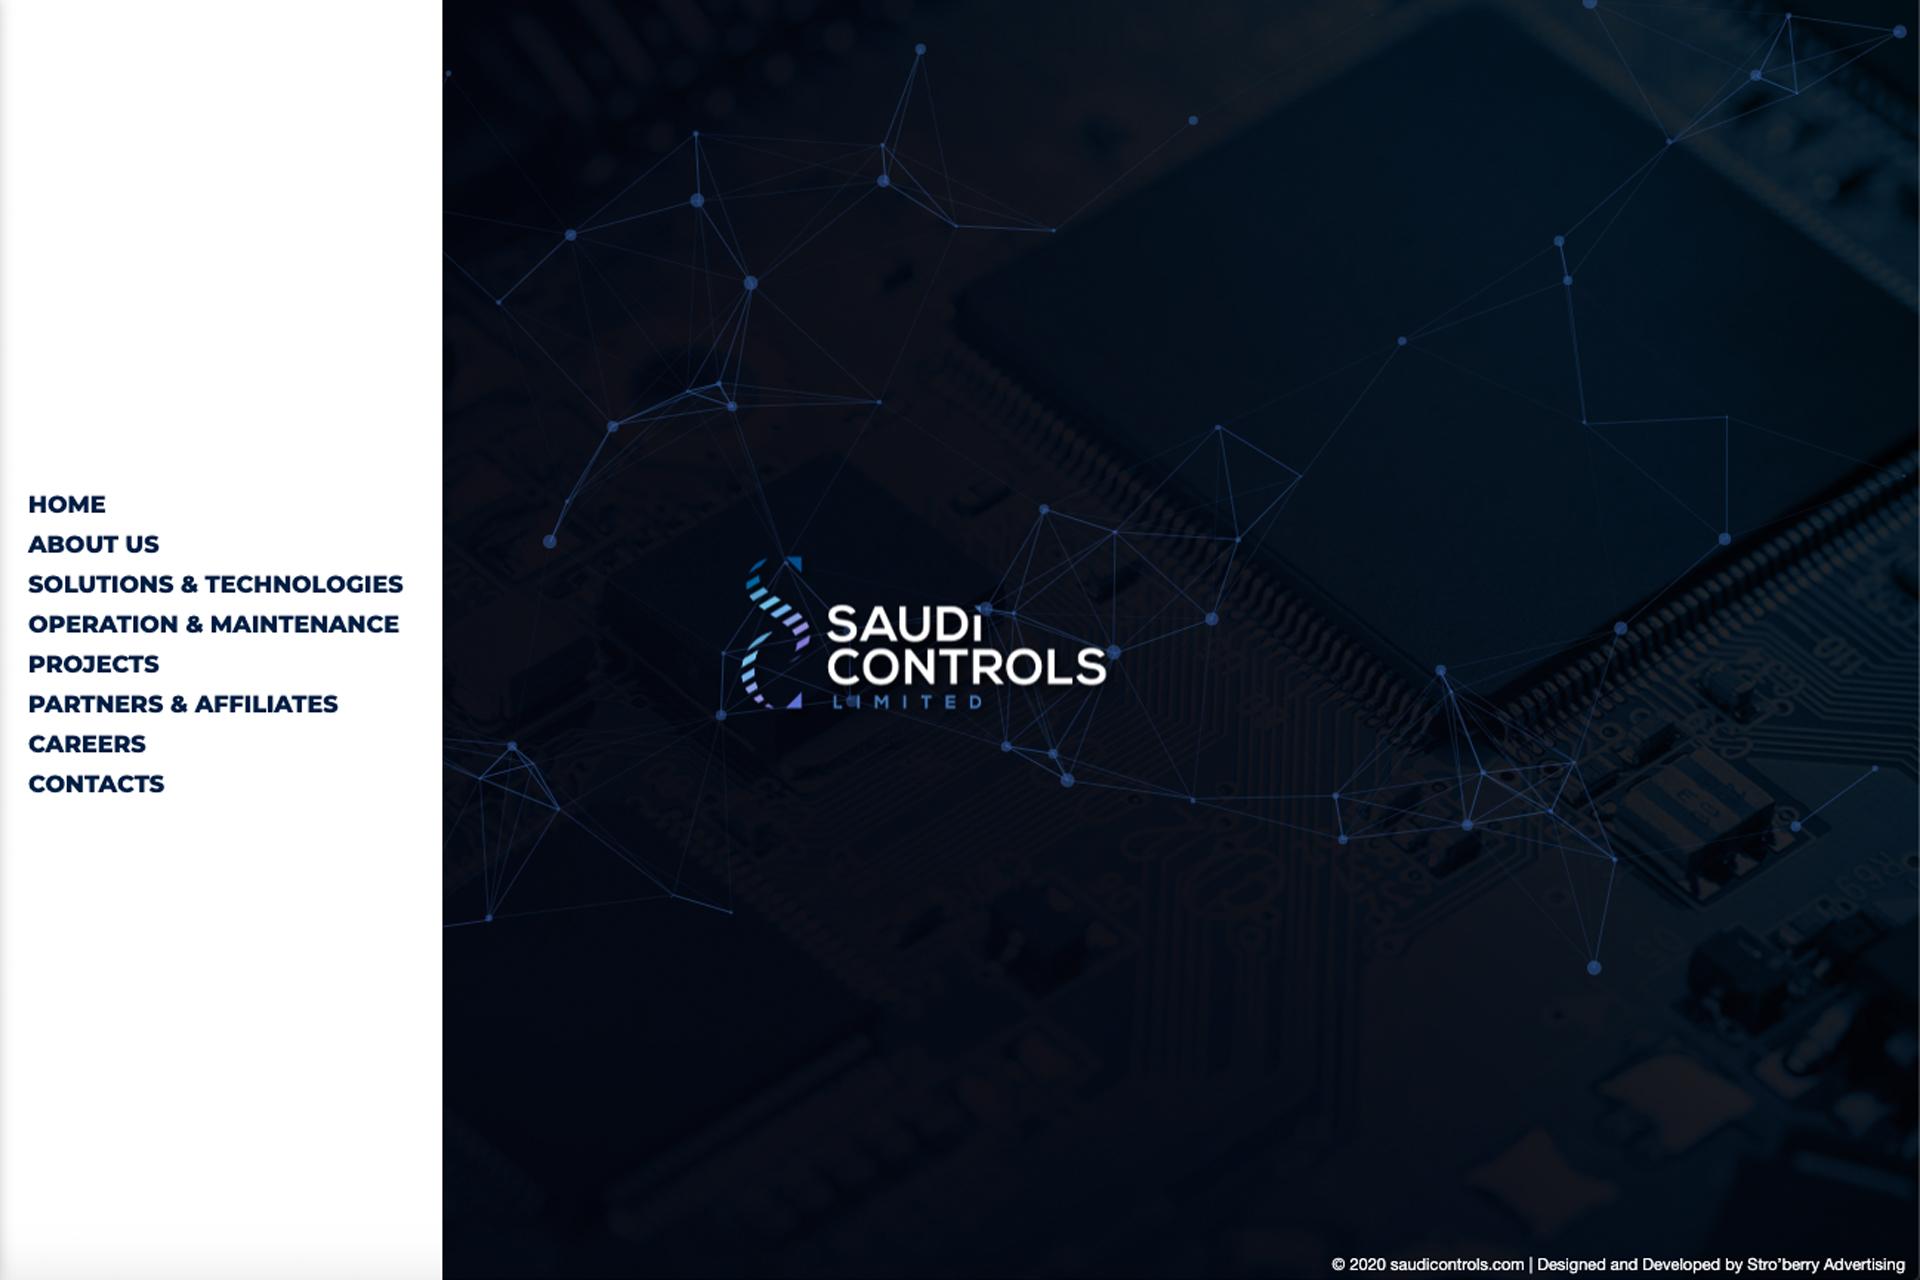 Saudi Controls